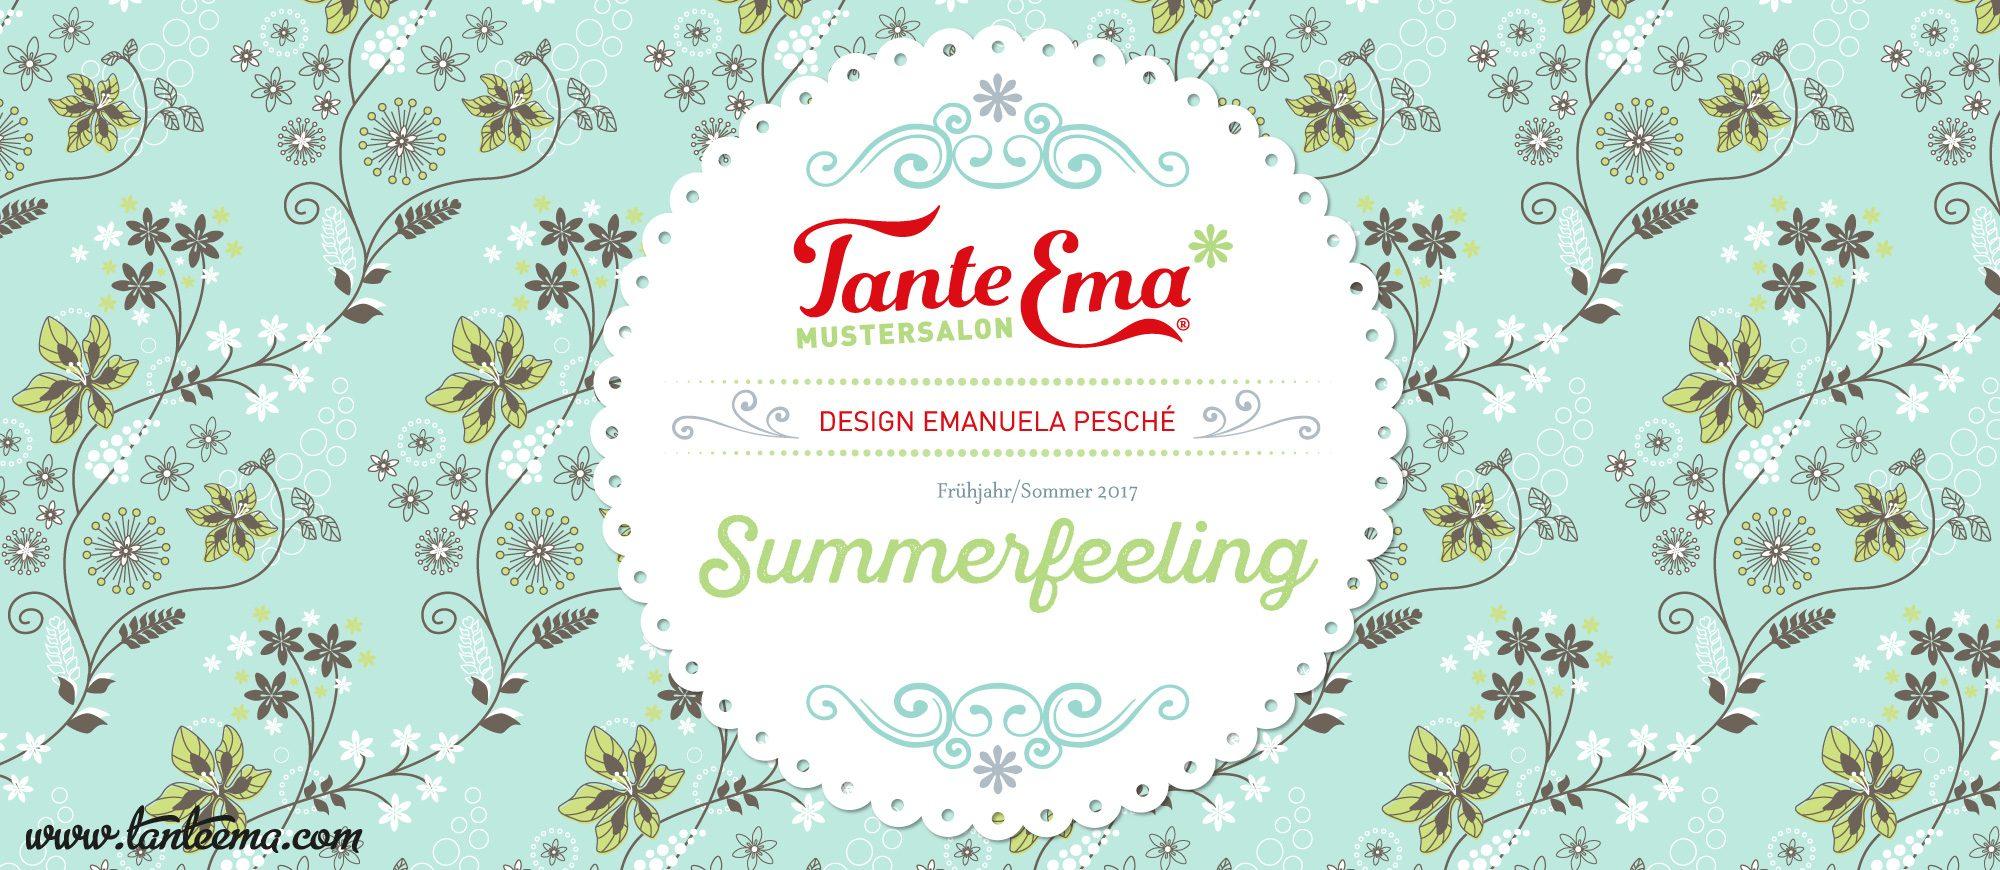 Tante Ema® Kollektion Summerfeeling